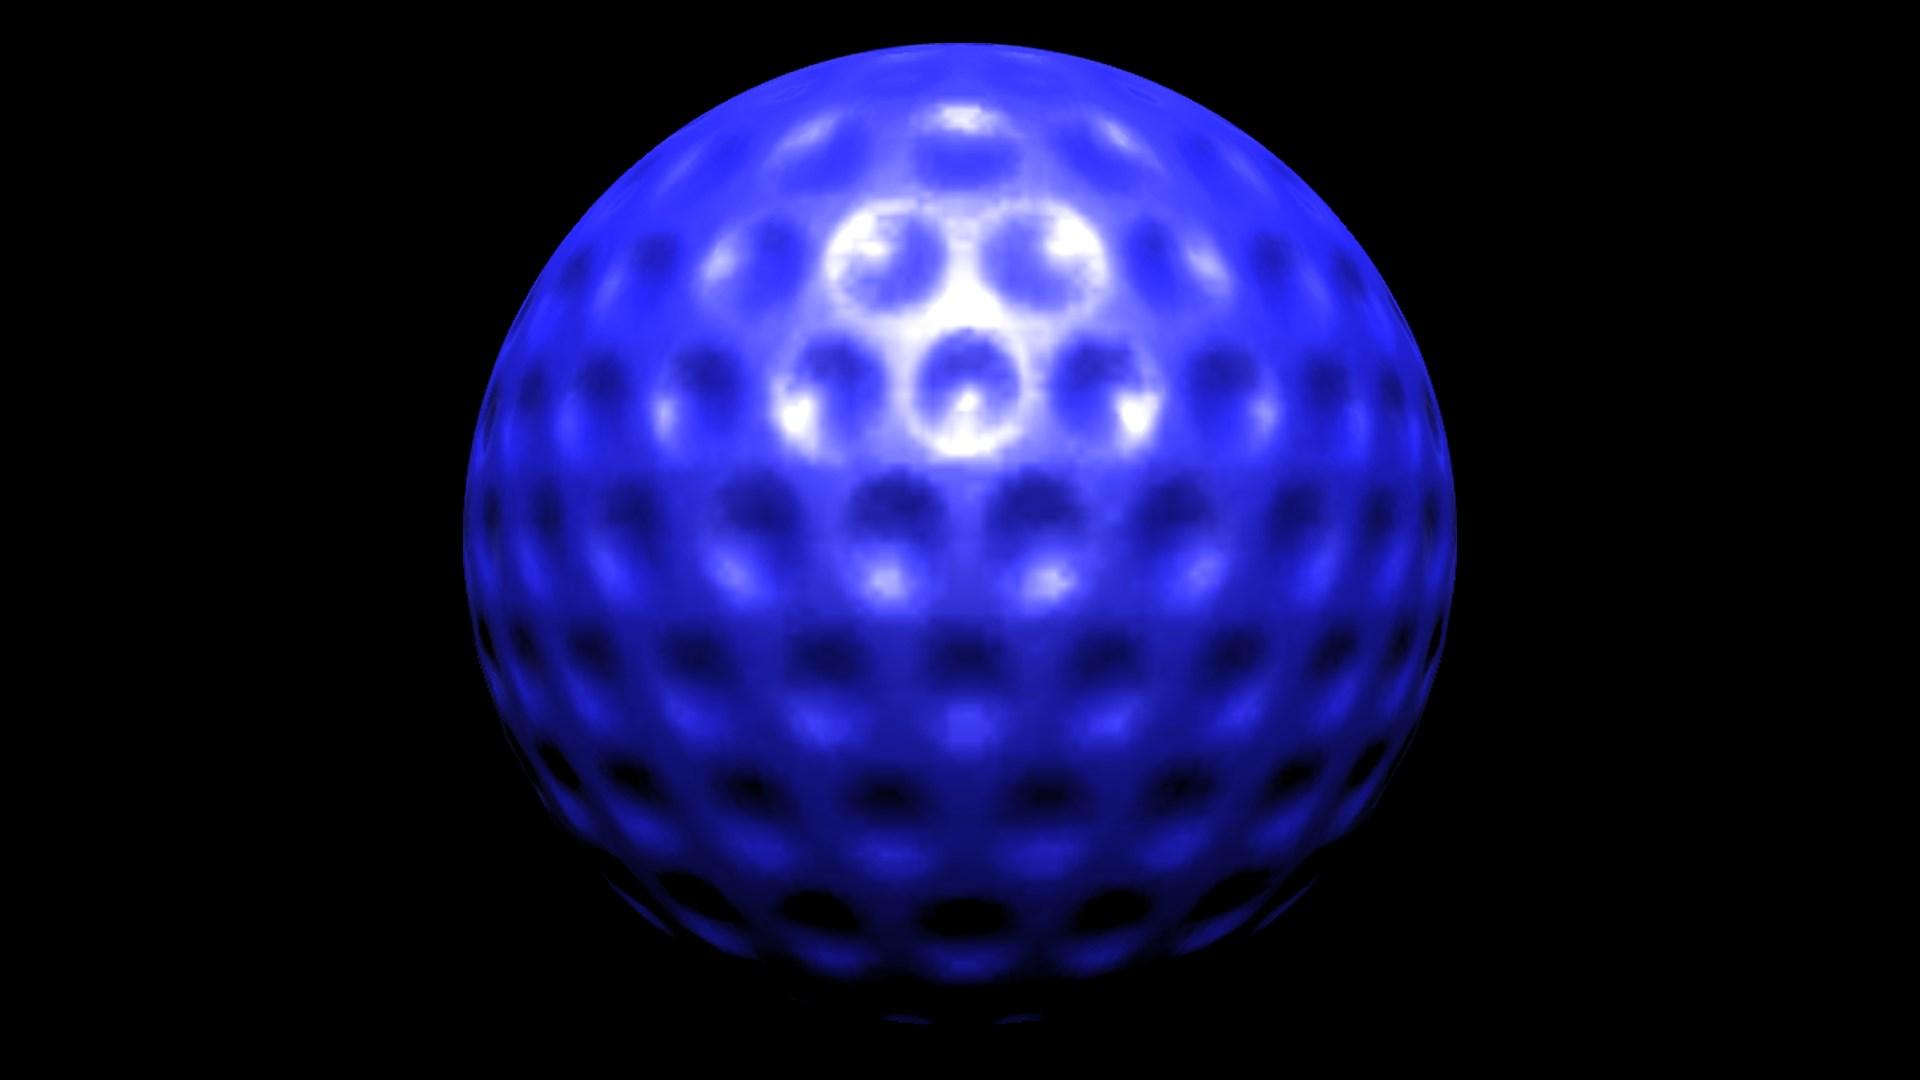 Get Miniature Golf - osbo com - Microsoft Store en-CY